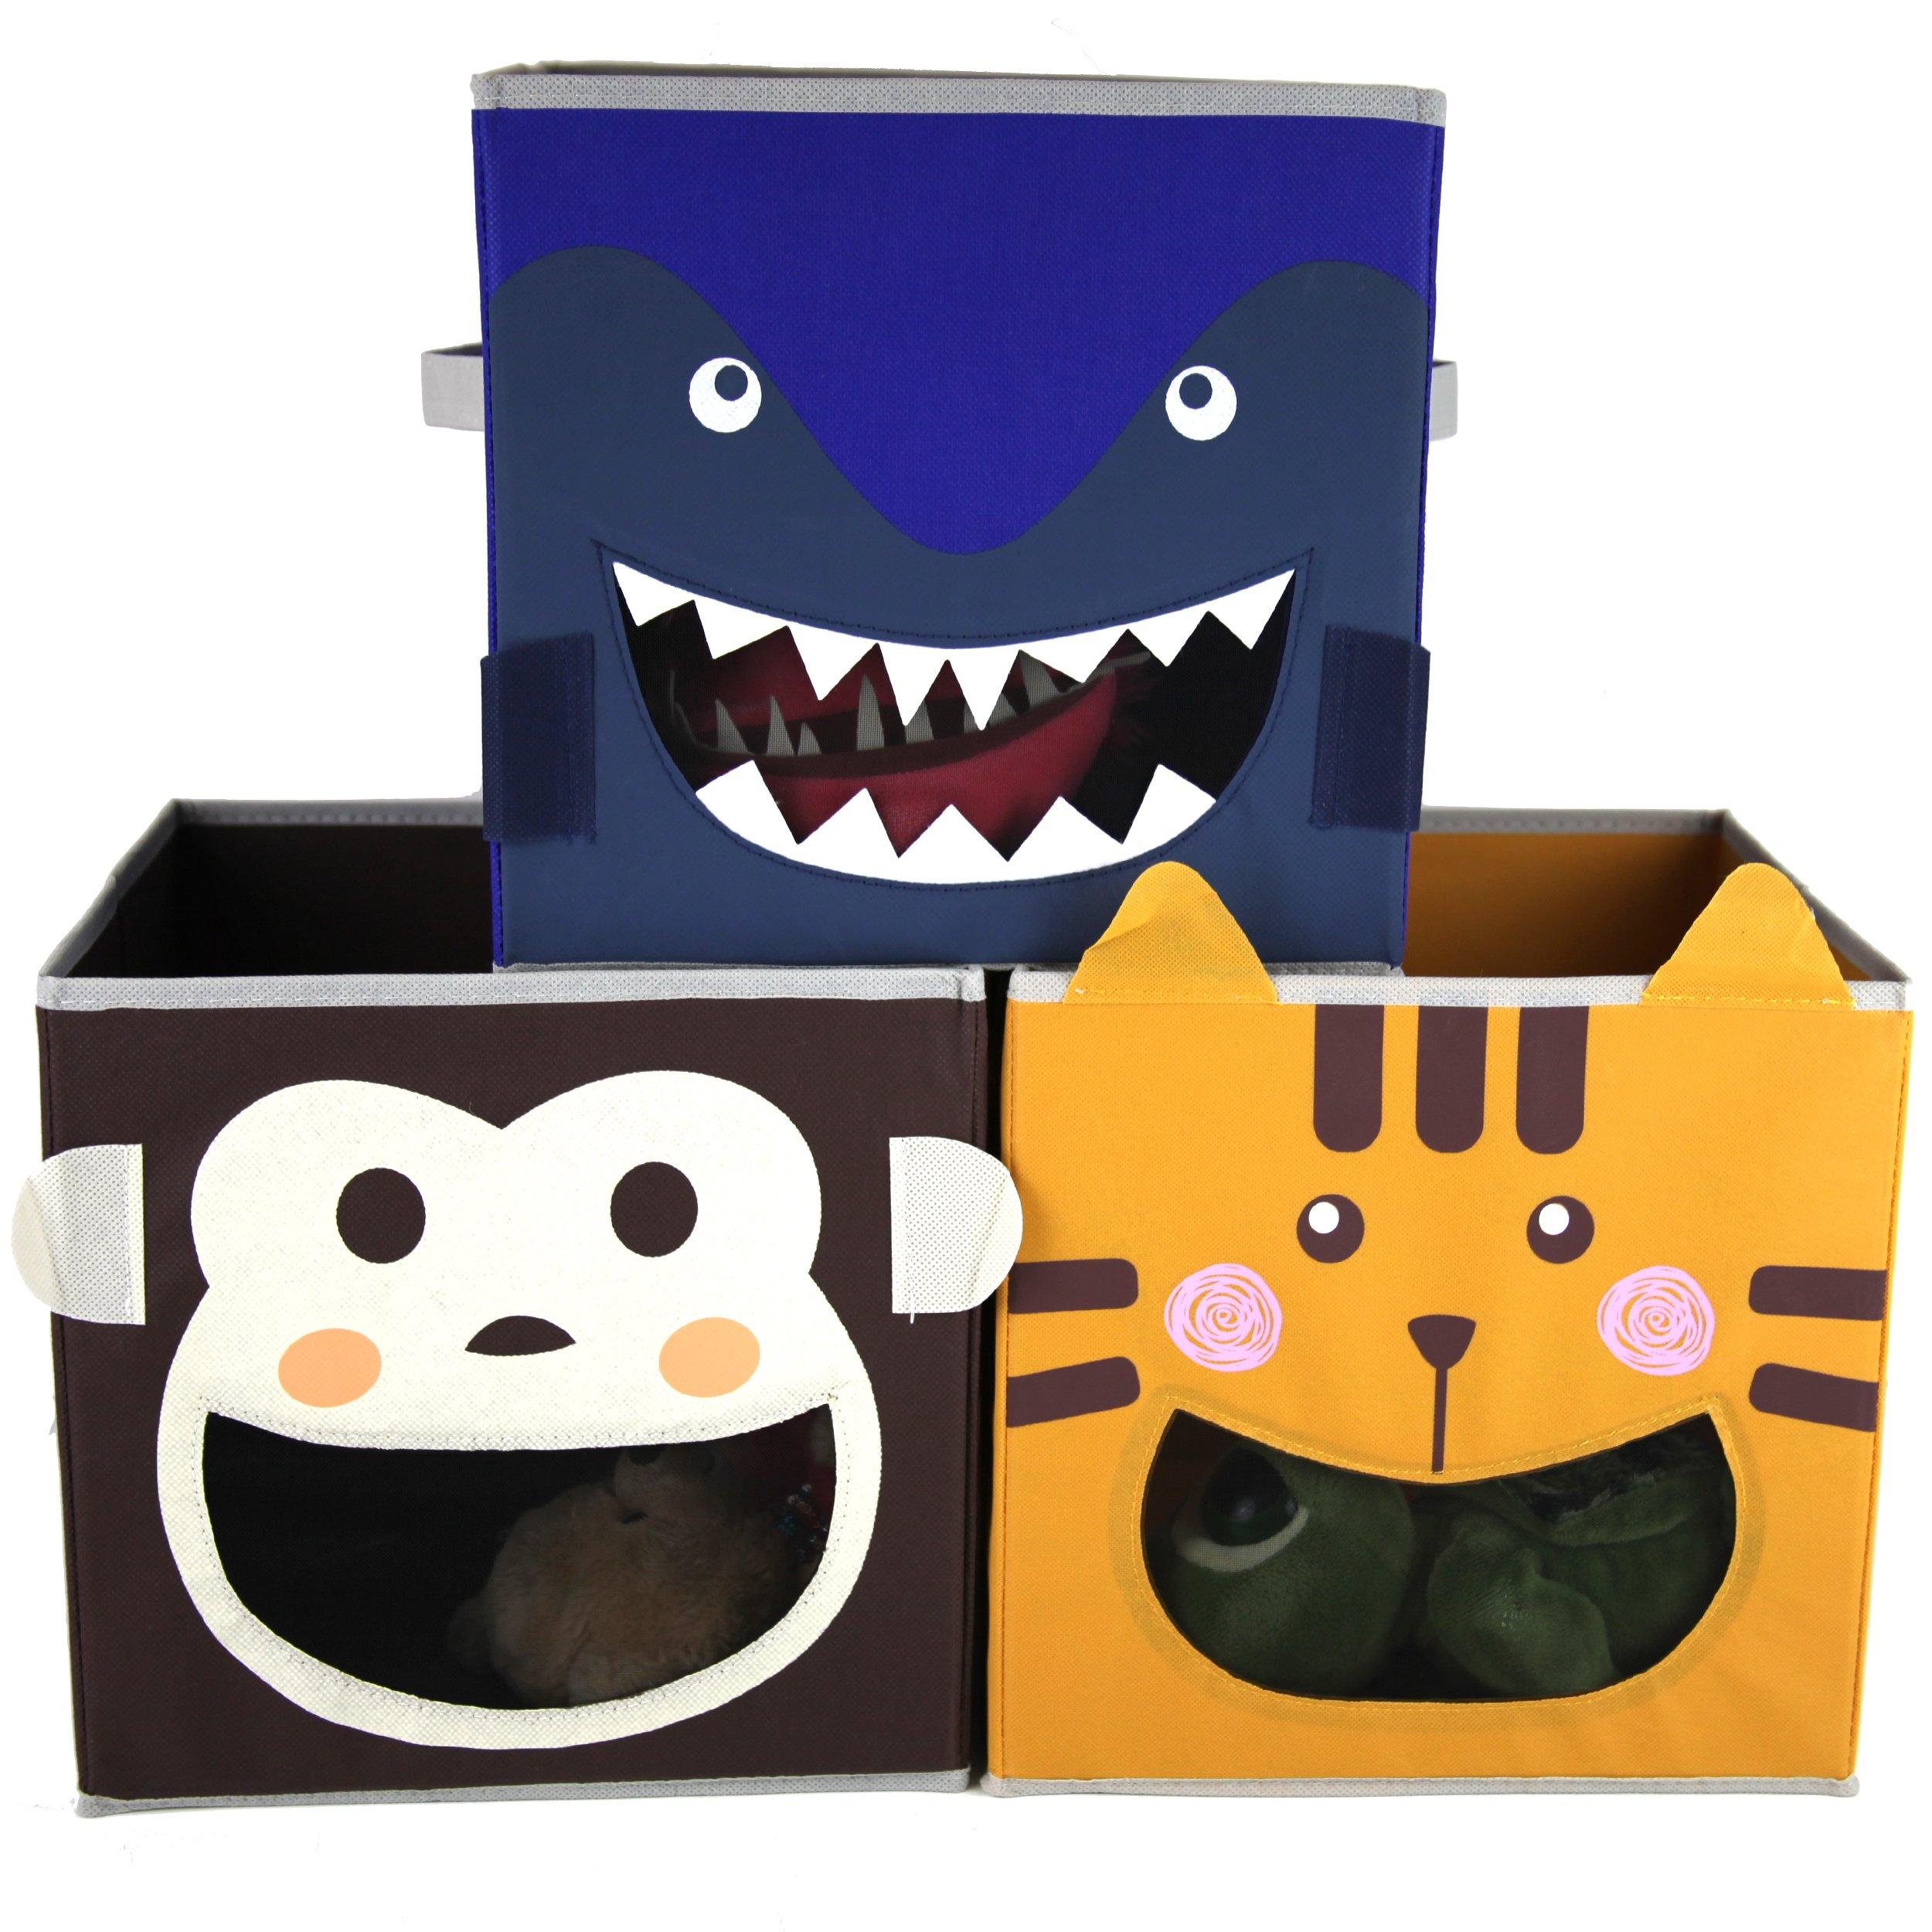 Paylak SCR499 Kids Storage Organizer Bins Fabric Set of 3 Animal Print with Handle